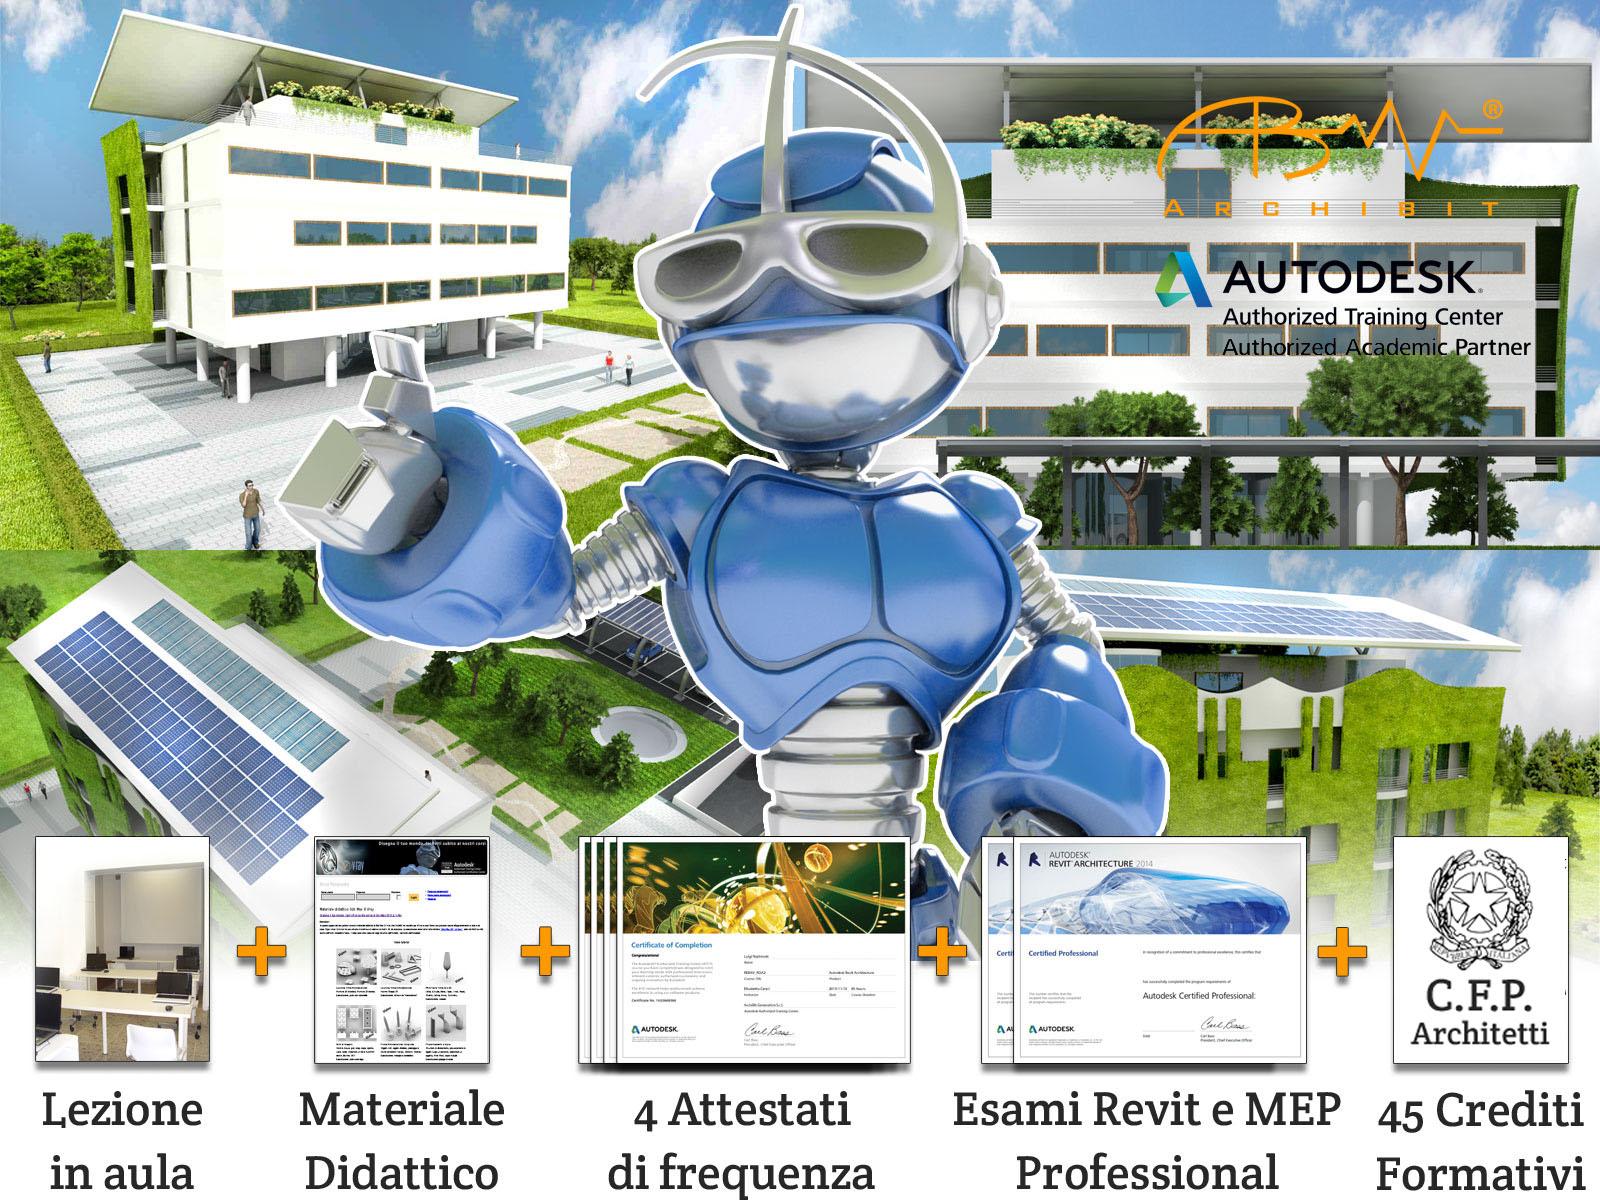 Corso Master Revit BIM Manager - Archibit Generation centro corsi Autodesk Roma